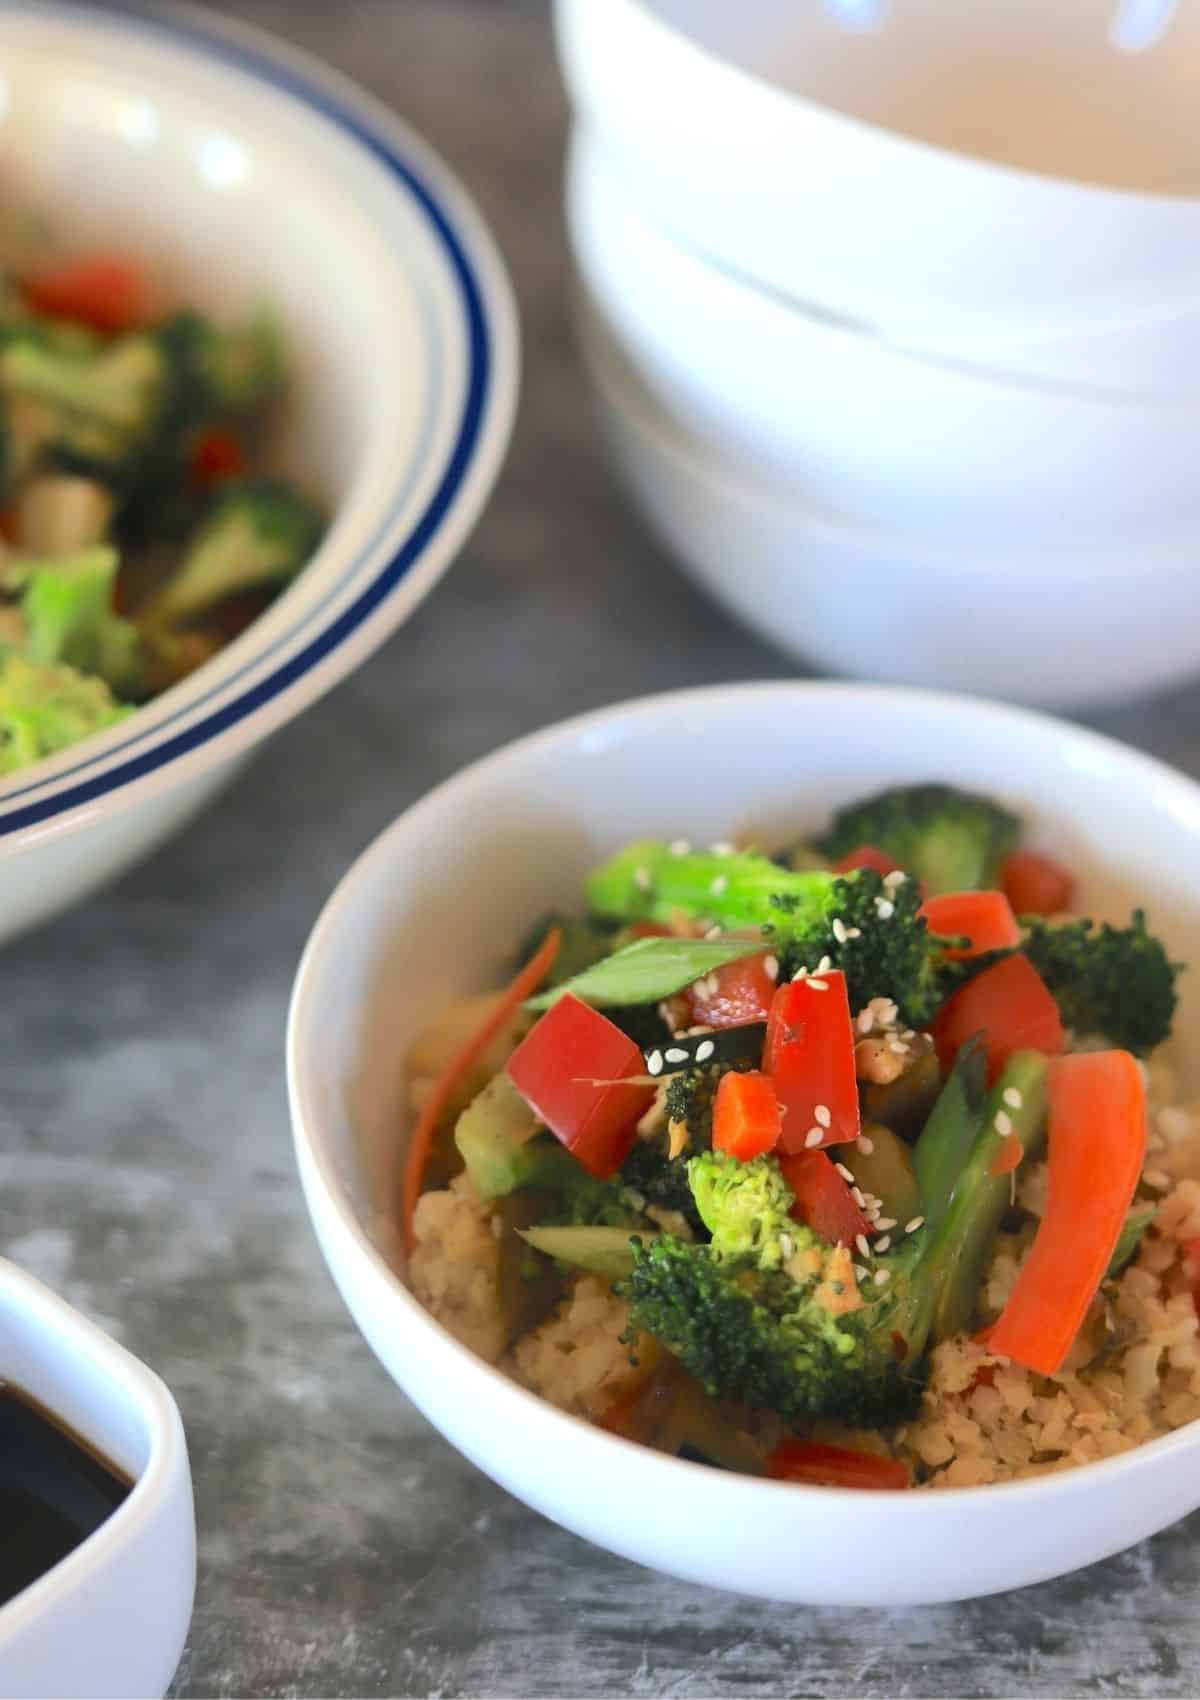 Vegetable Stir Fry with Cauliflower Rice